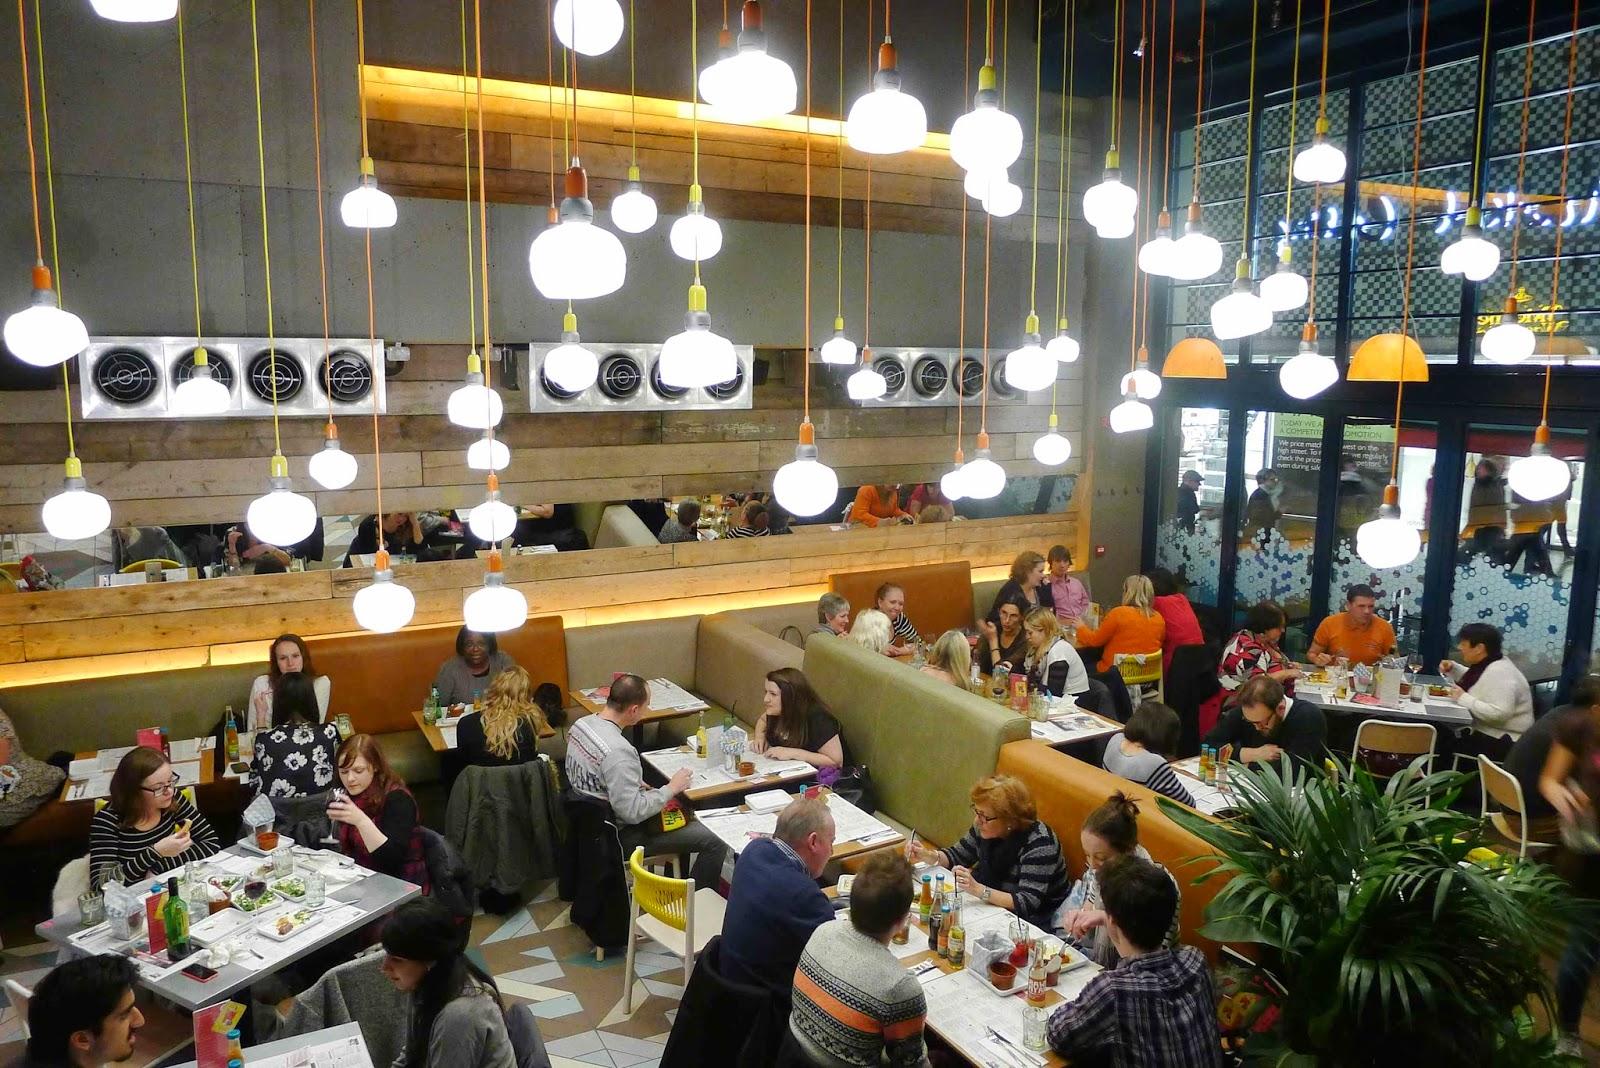 Mexican Street Food Restaurant Cardiff